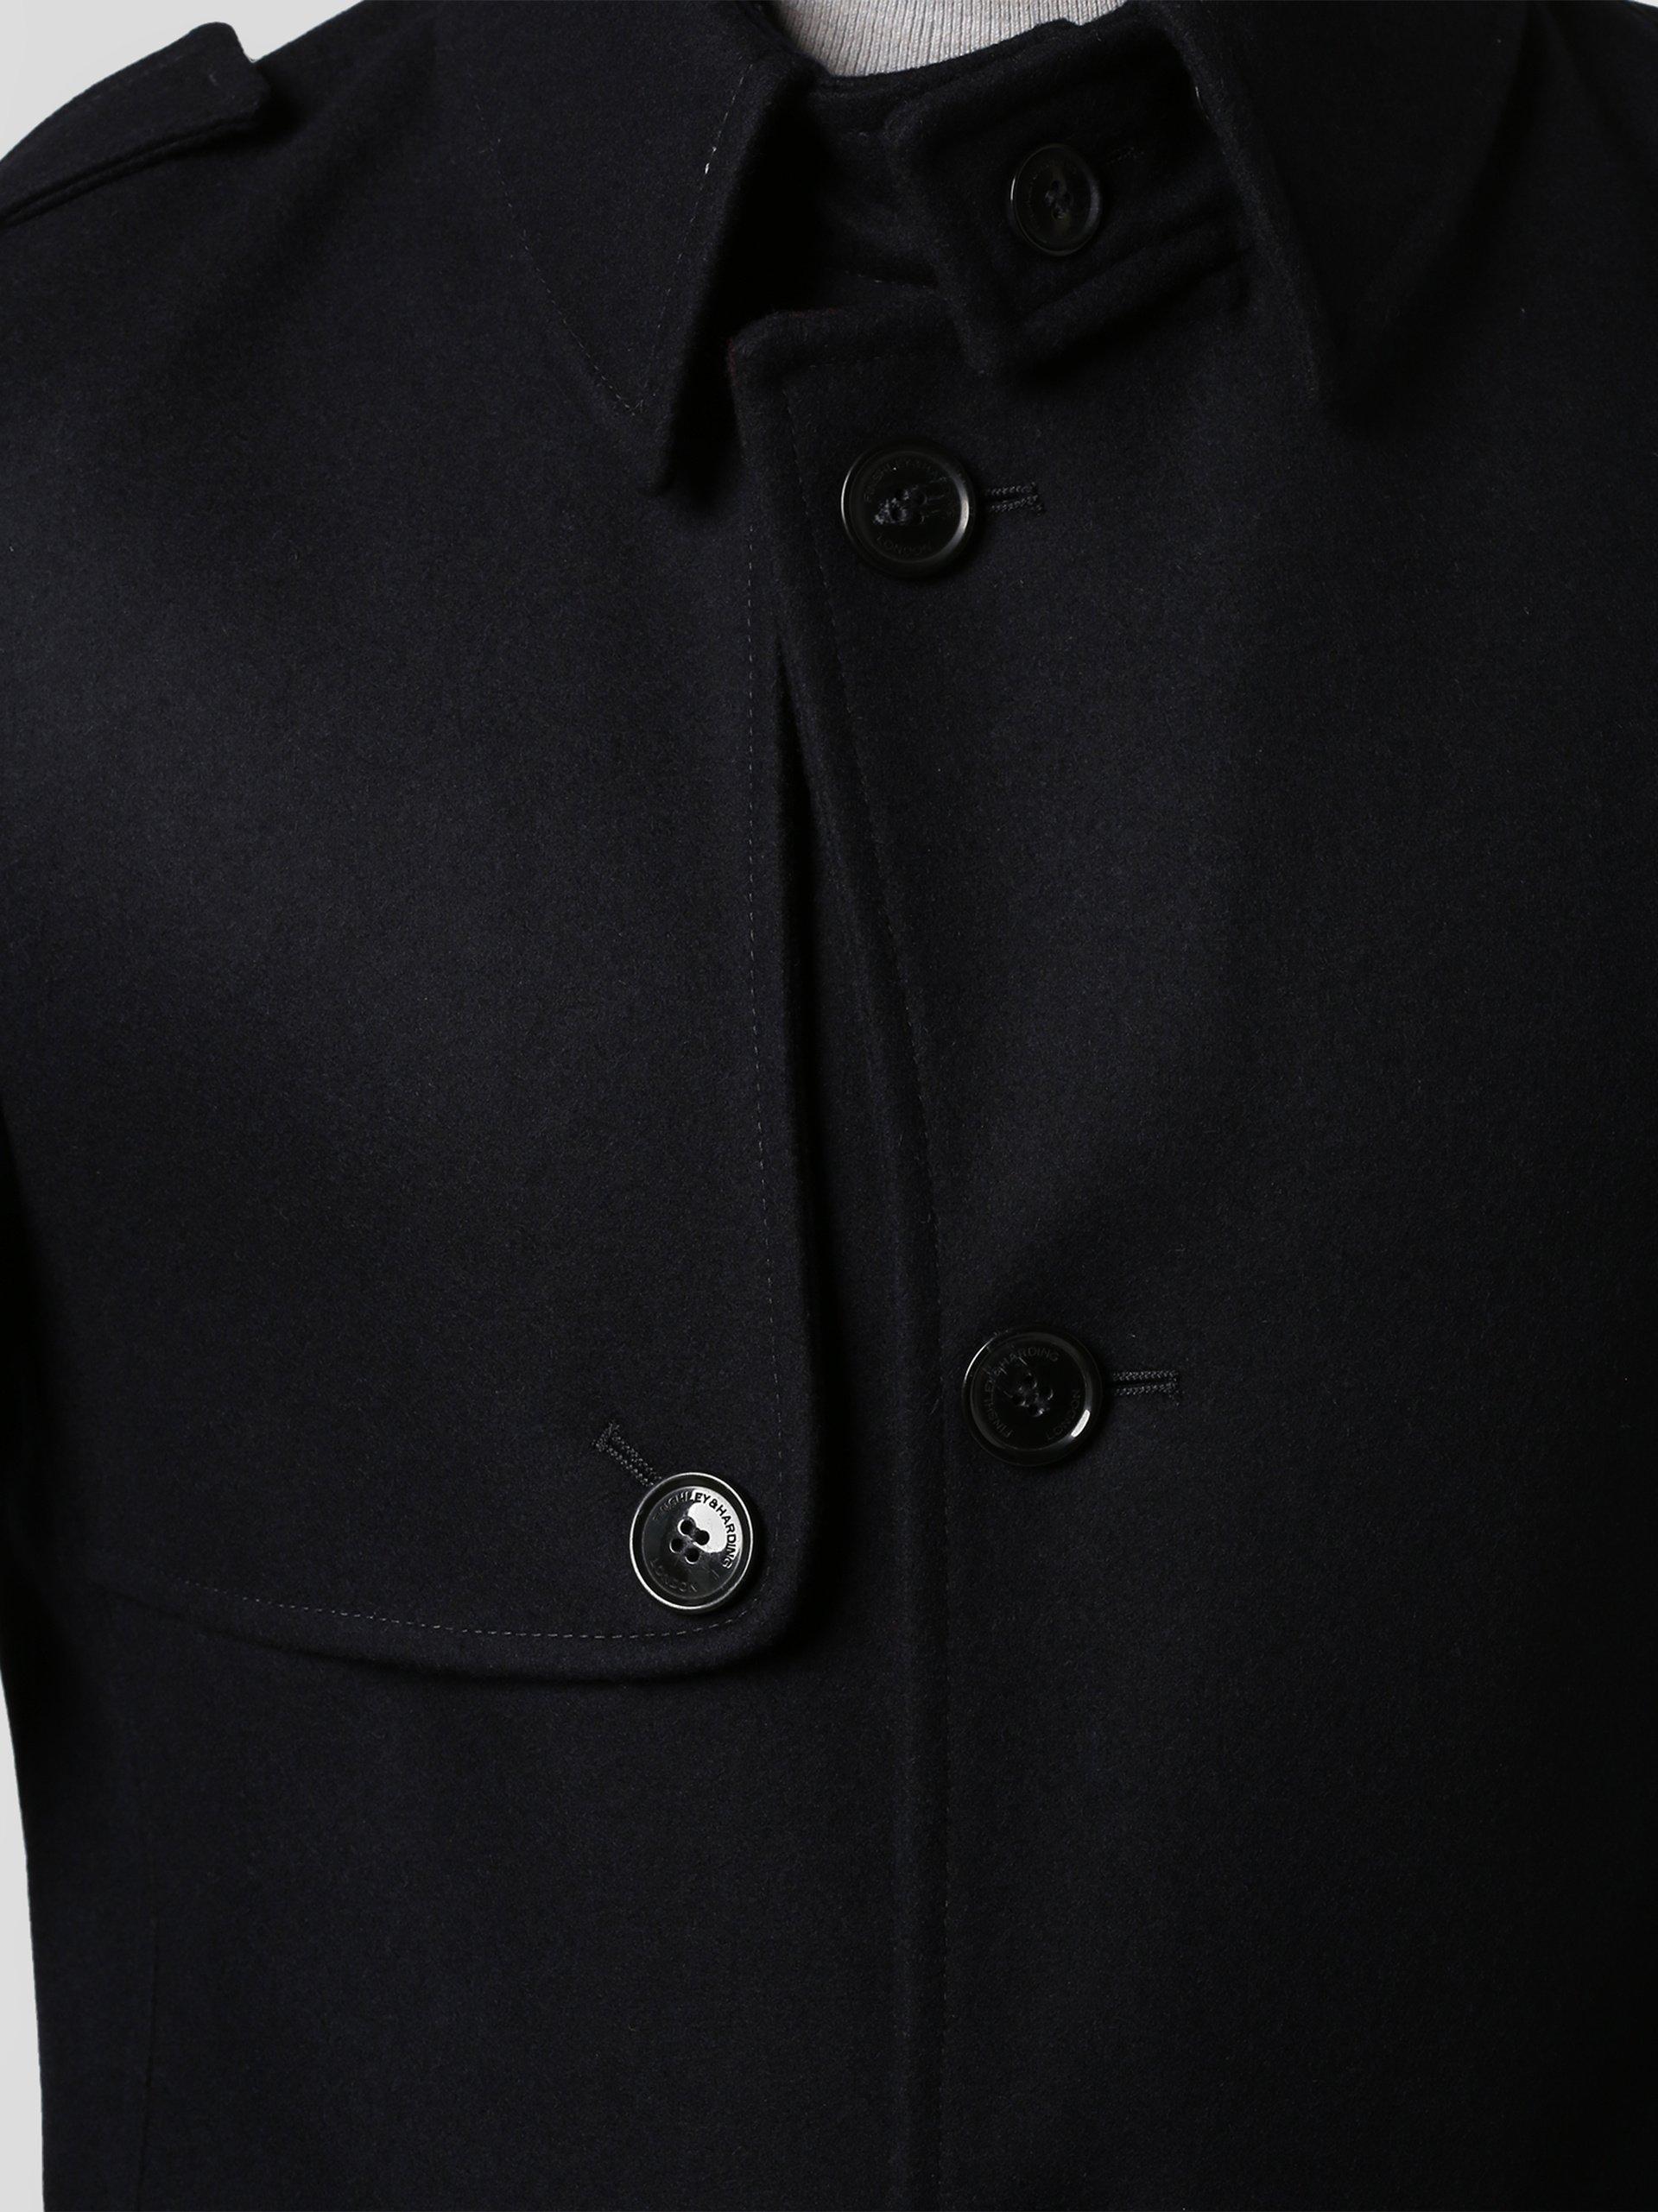 Finshley & Harding London Płaszcz męski